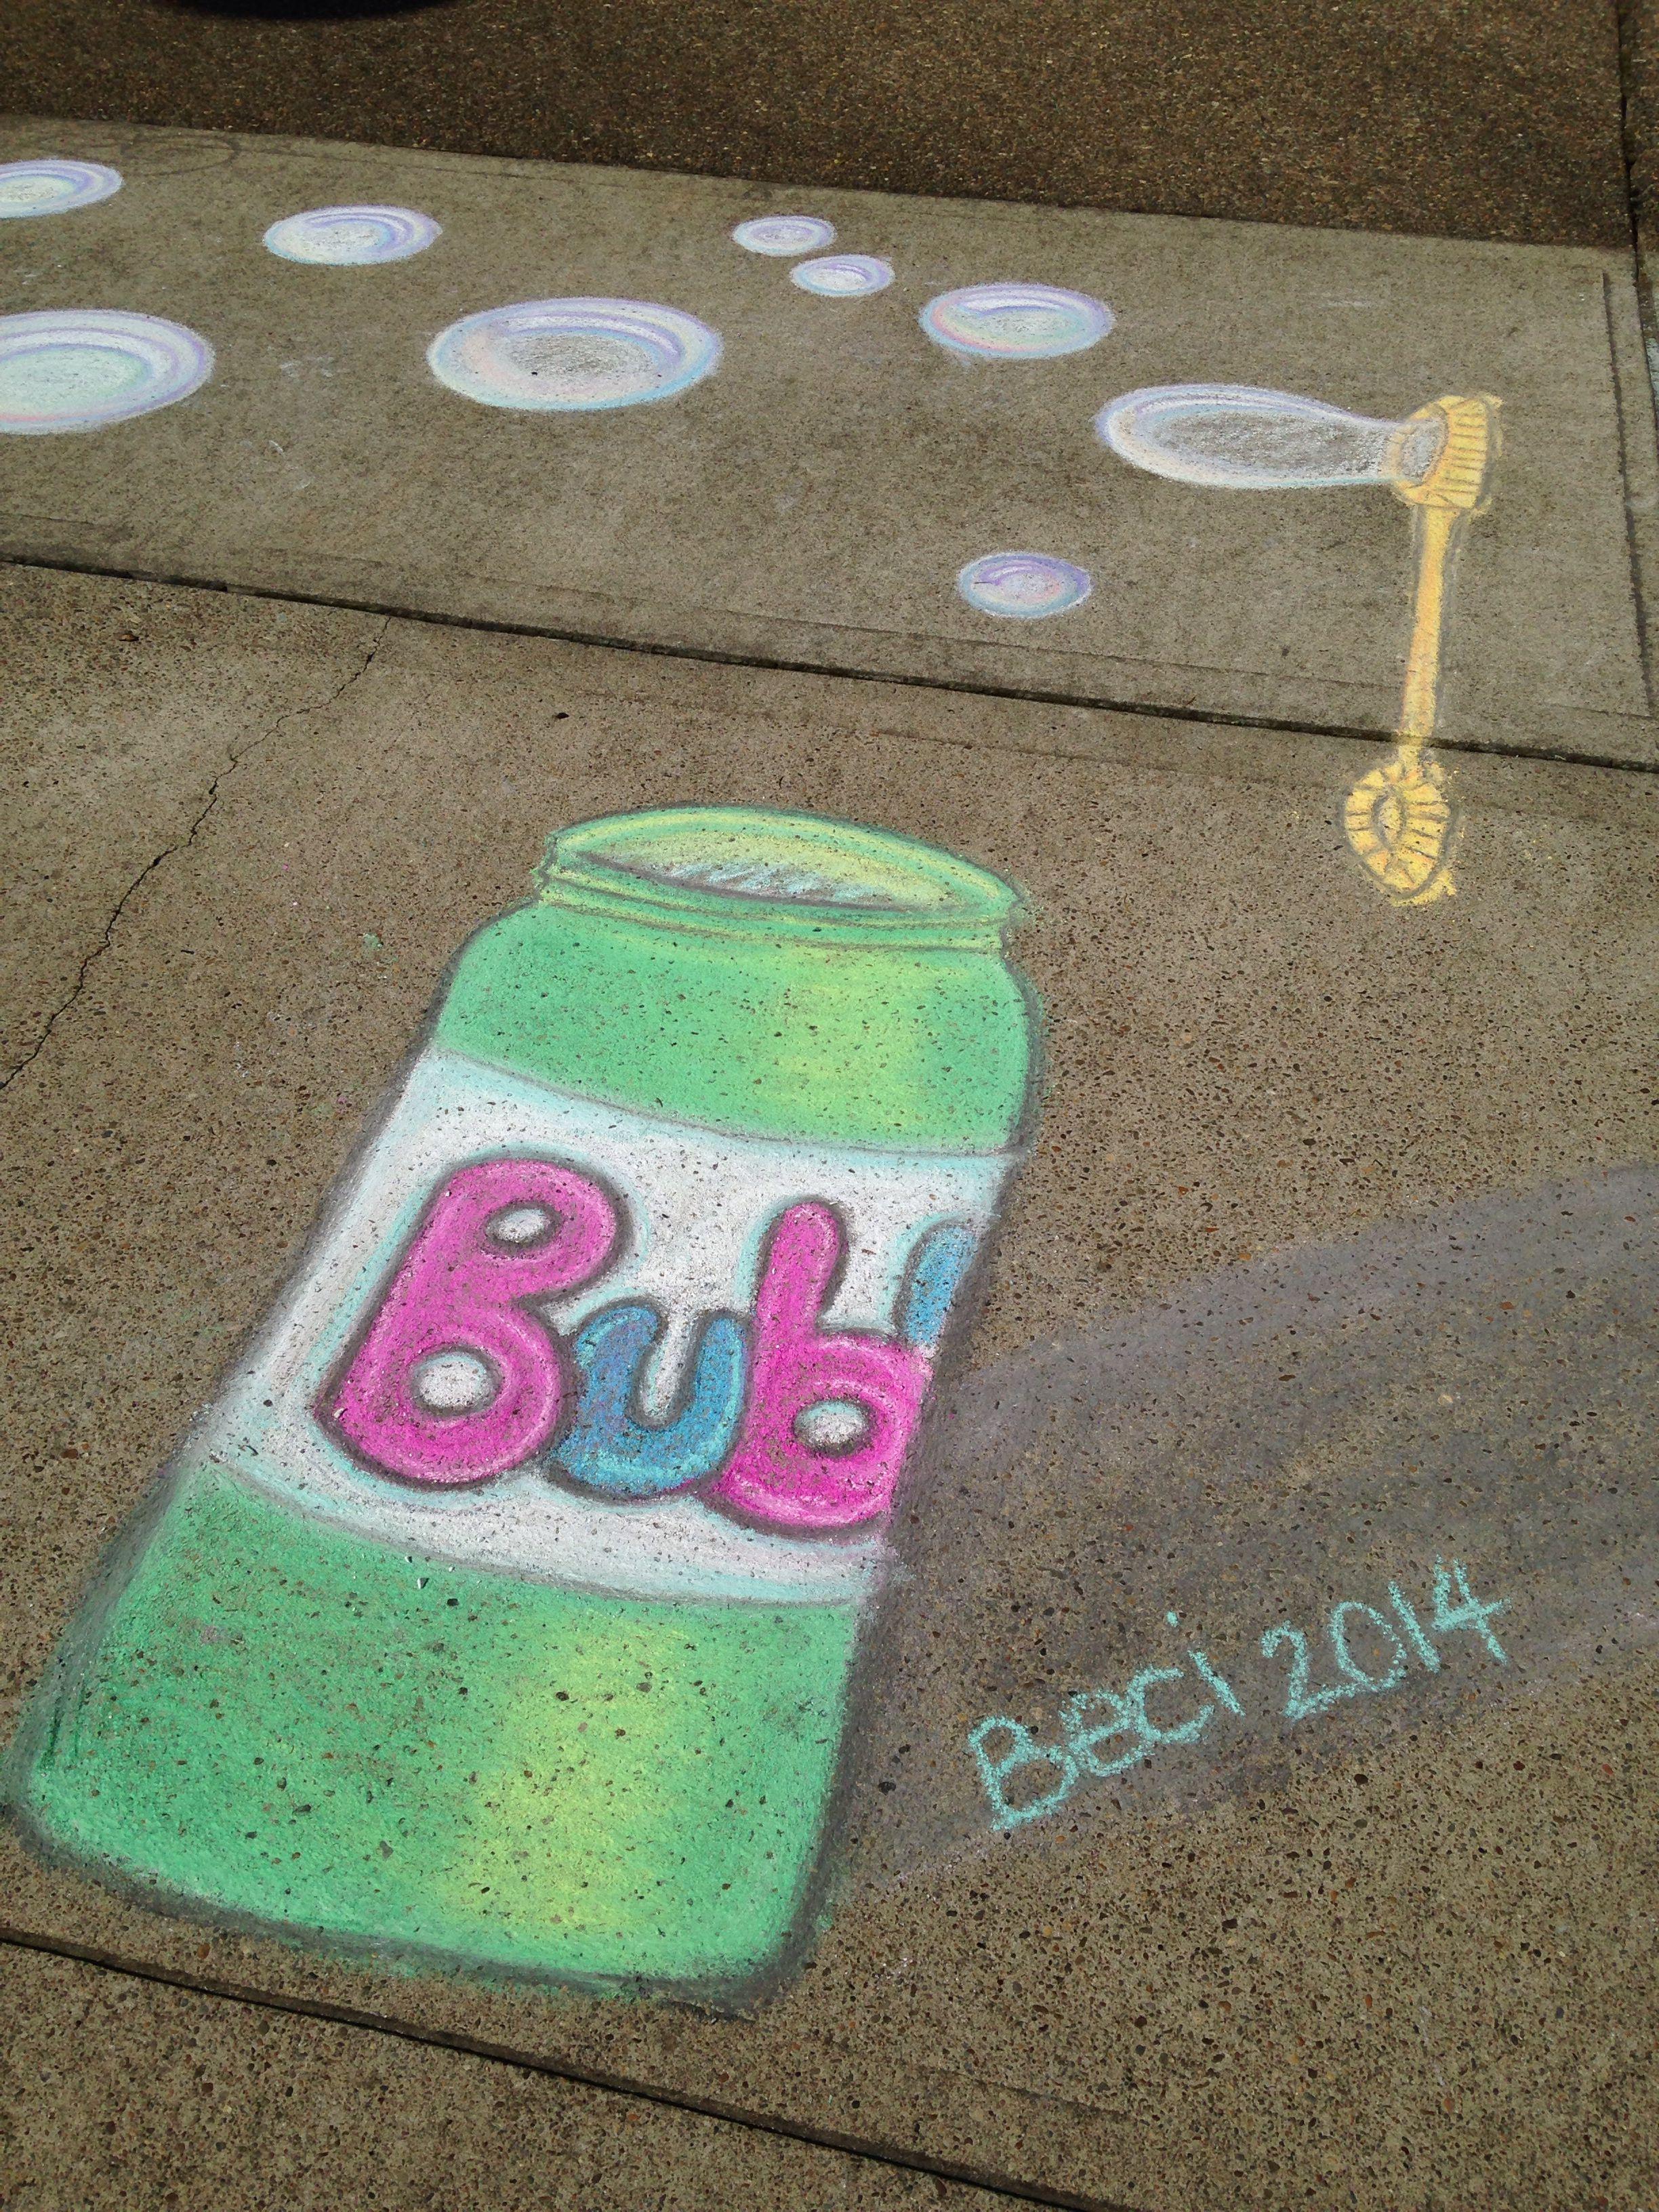 Sidewalk Chalk Bubbles Sidewalk Chalk Art Street Chalk Art